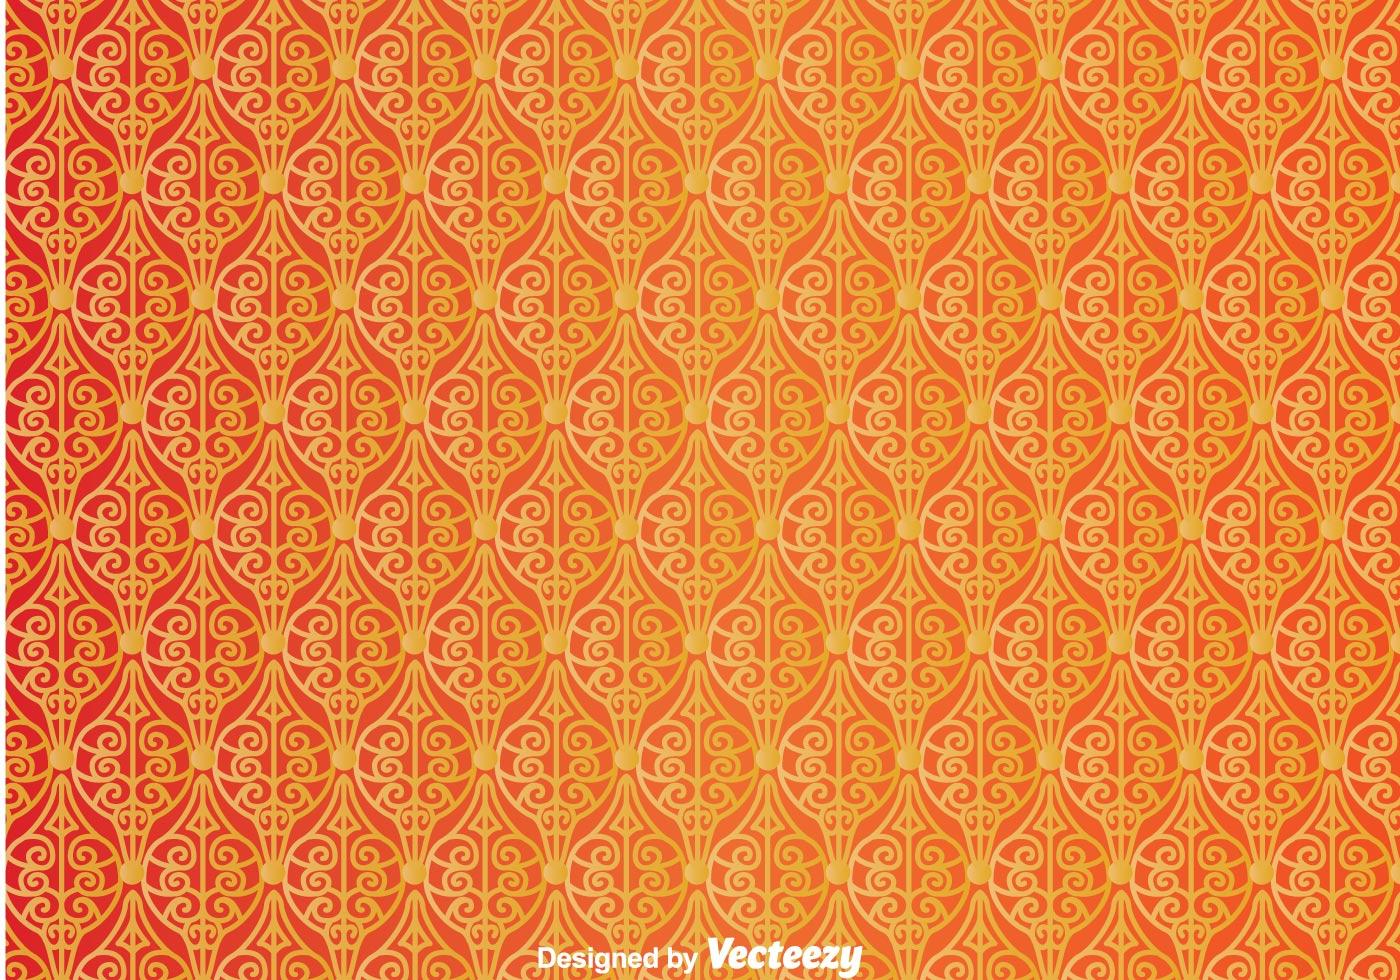 Ornament Orange Wall Tapestry  Download Free Vectors